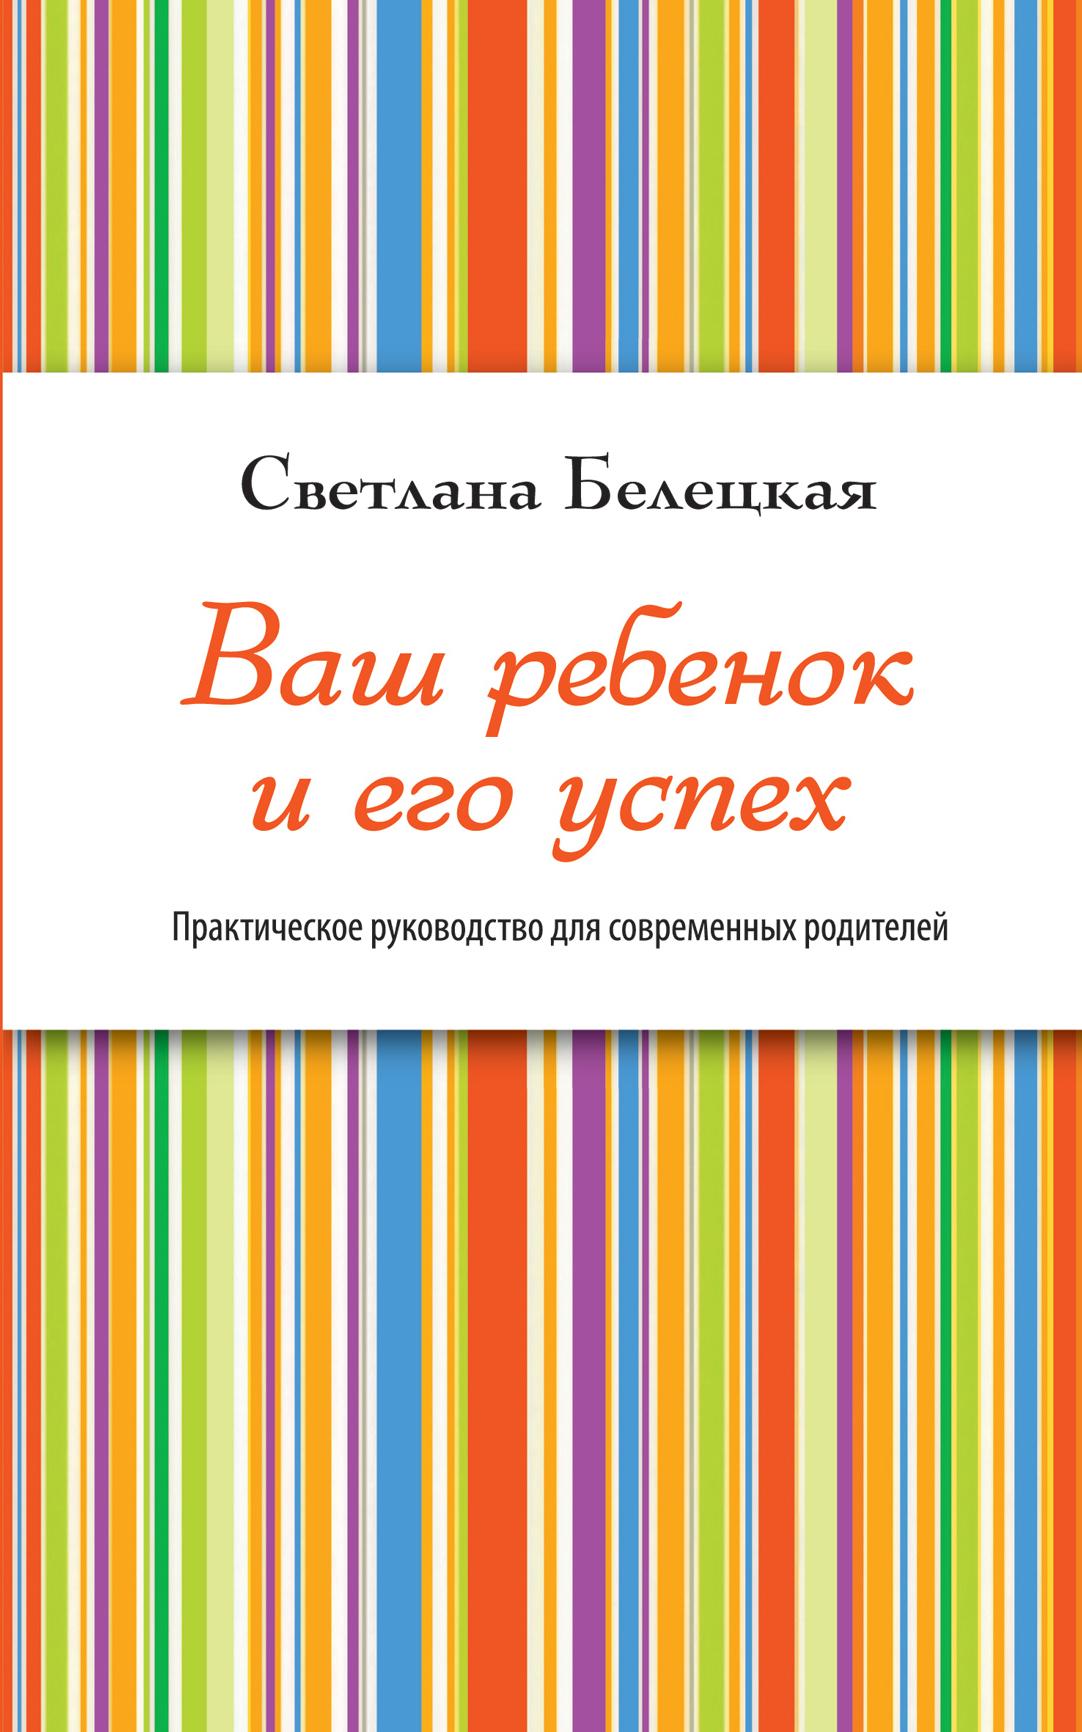 Ваш ребенок и его успех от book24.ru